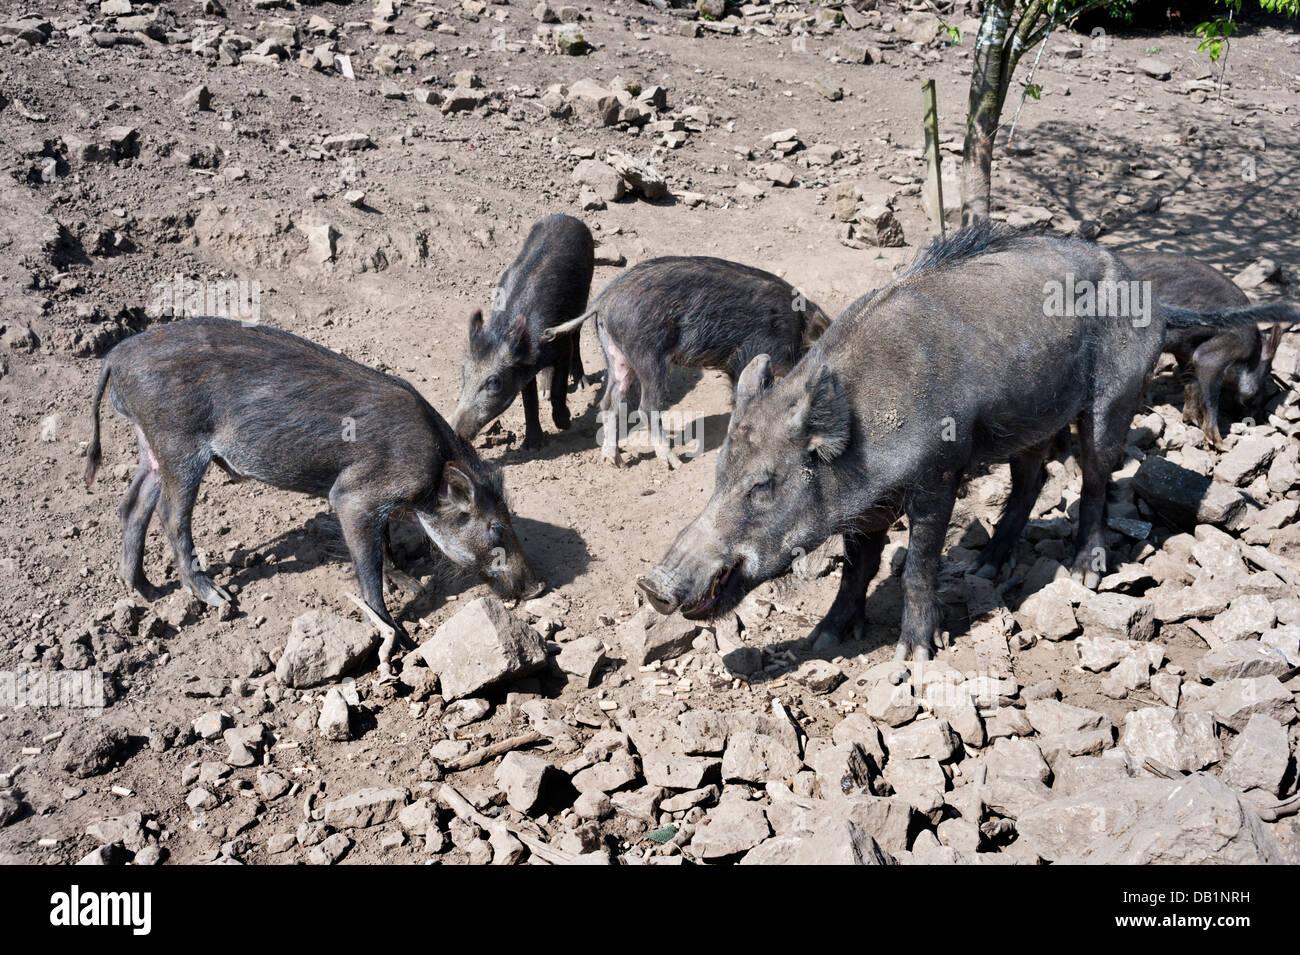 Wild boar graze at Bolton Abbey, North Yorkshire, UK - Stock Image